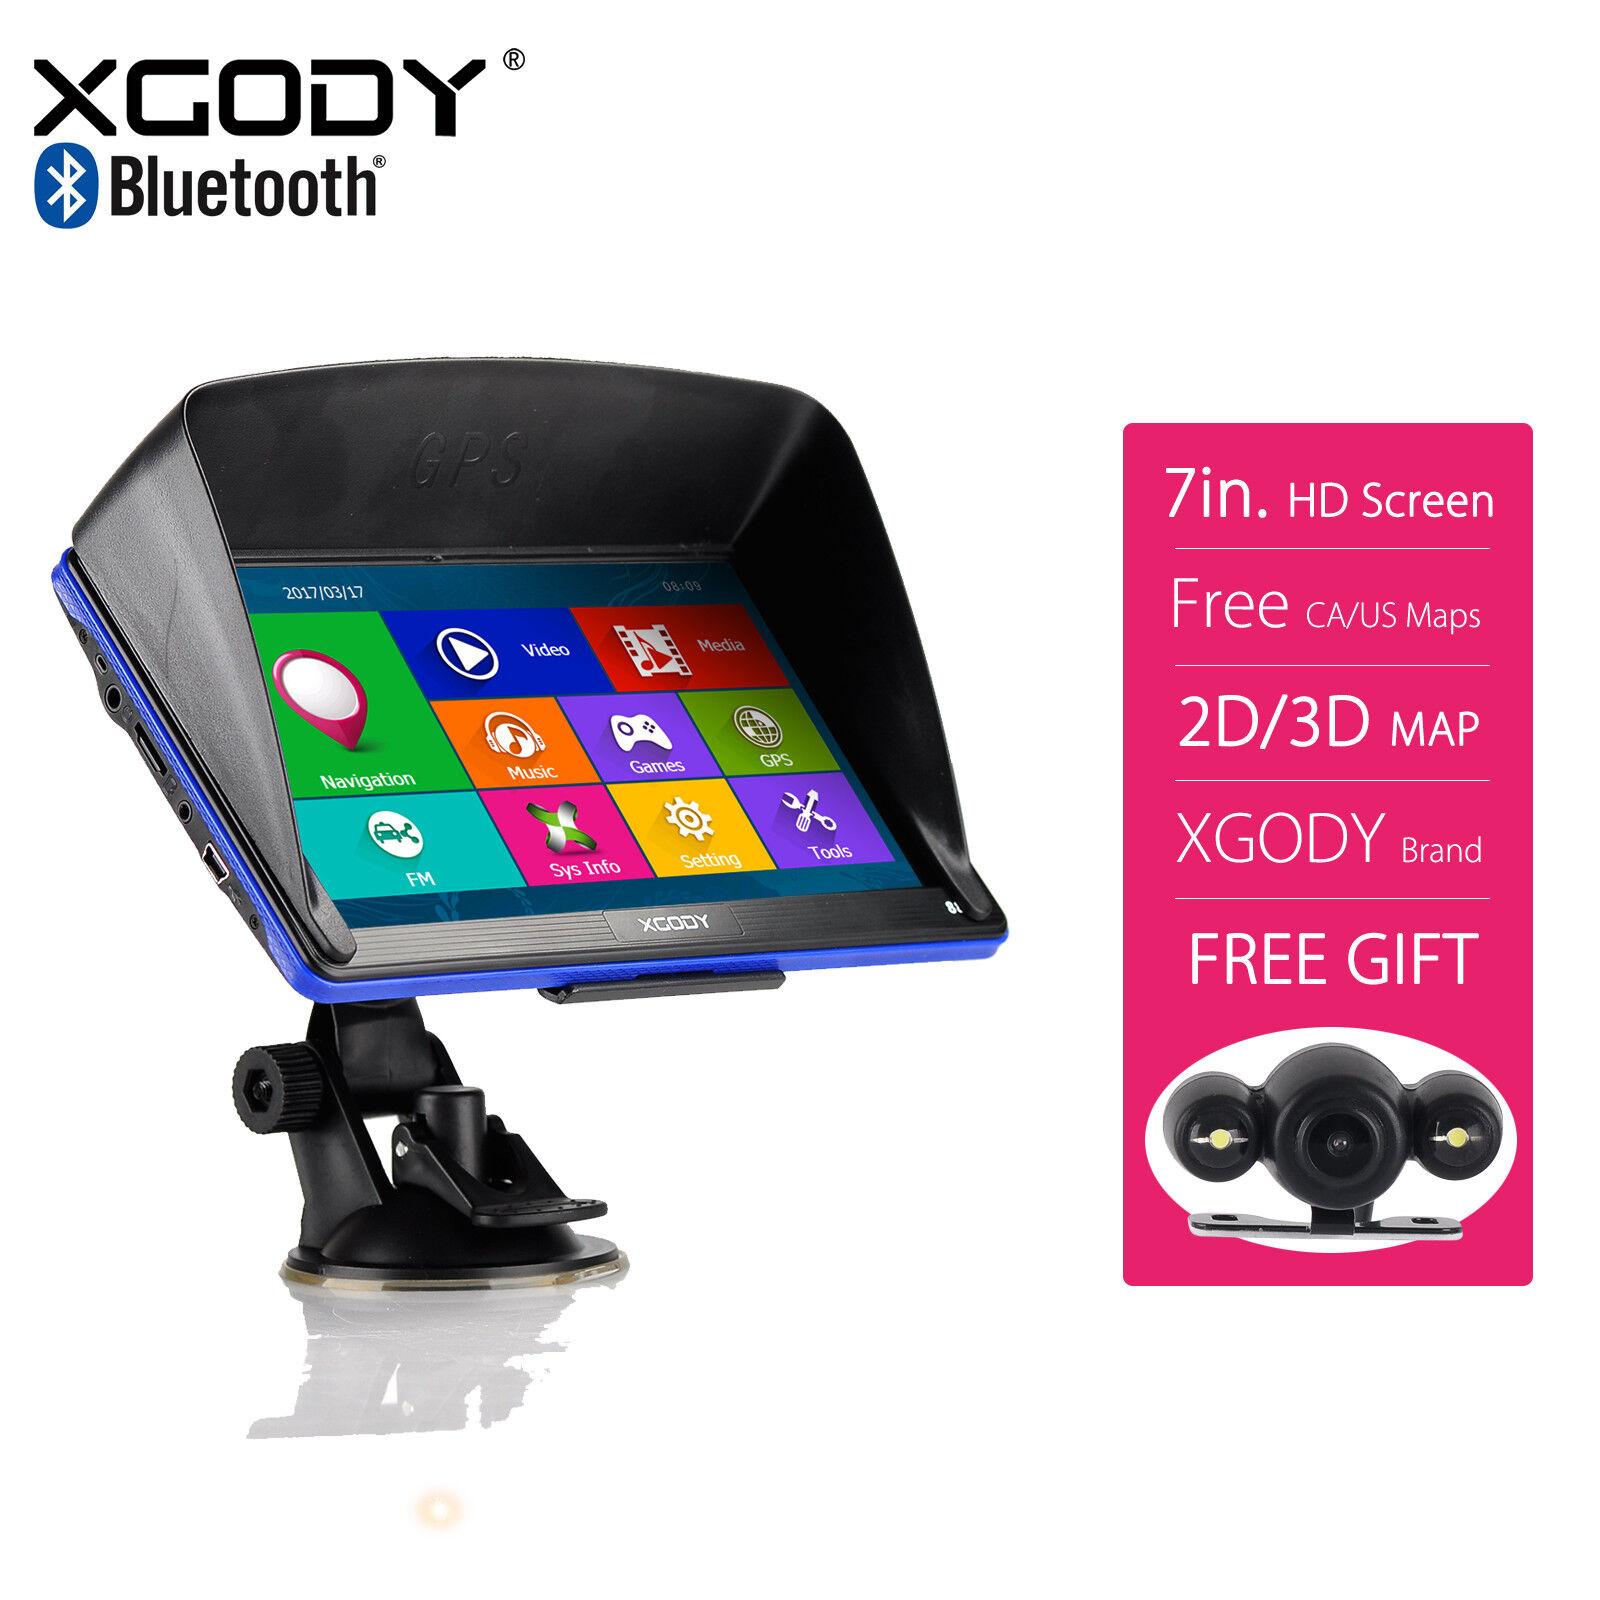 XGODY 886 7'' Auto Bluetooth GPS Navigation + Car Rear View Monitor Camera auto bluetooth camera car Featured gps monitor navigation rear view xgody